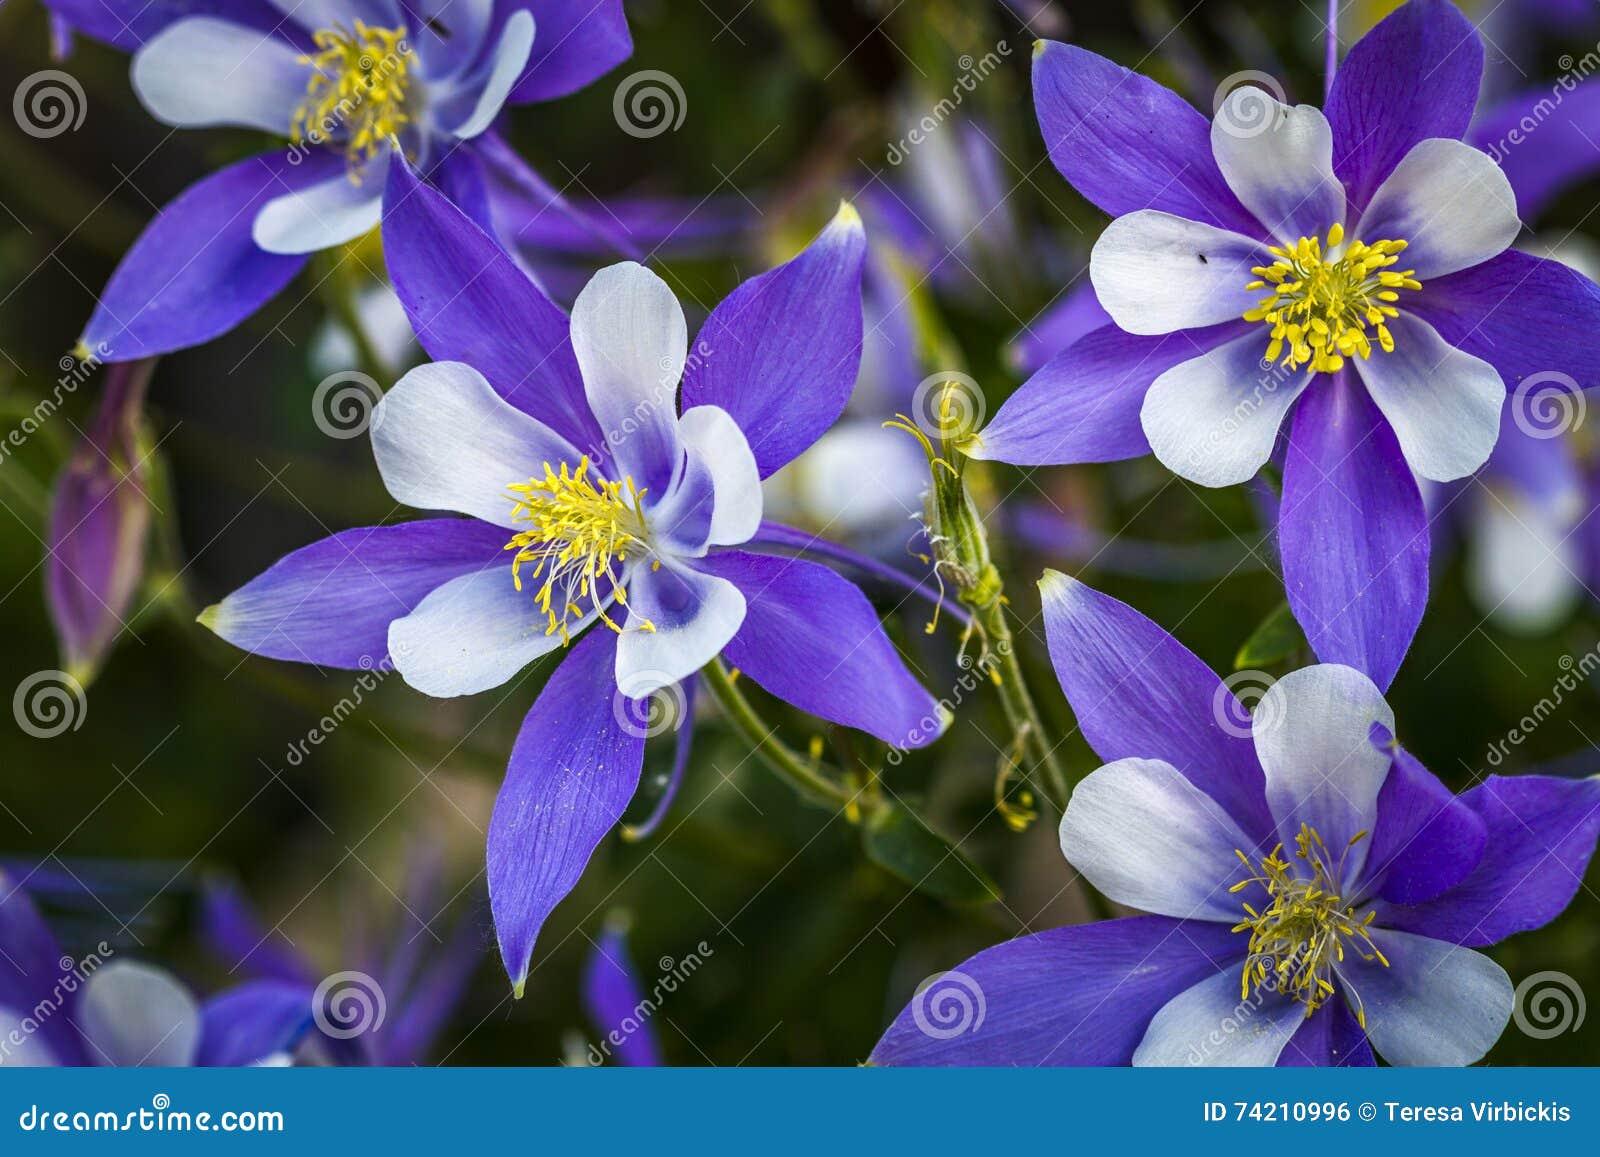 Colorado state flower blue columbines stock photo image of outdoor colorado state flower blue columbines izmirmasajfo Gallery